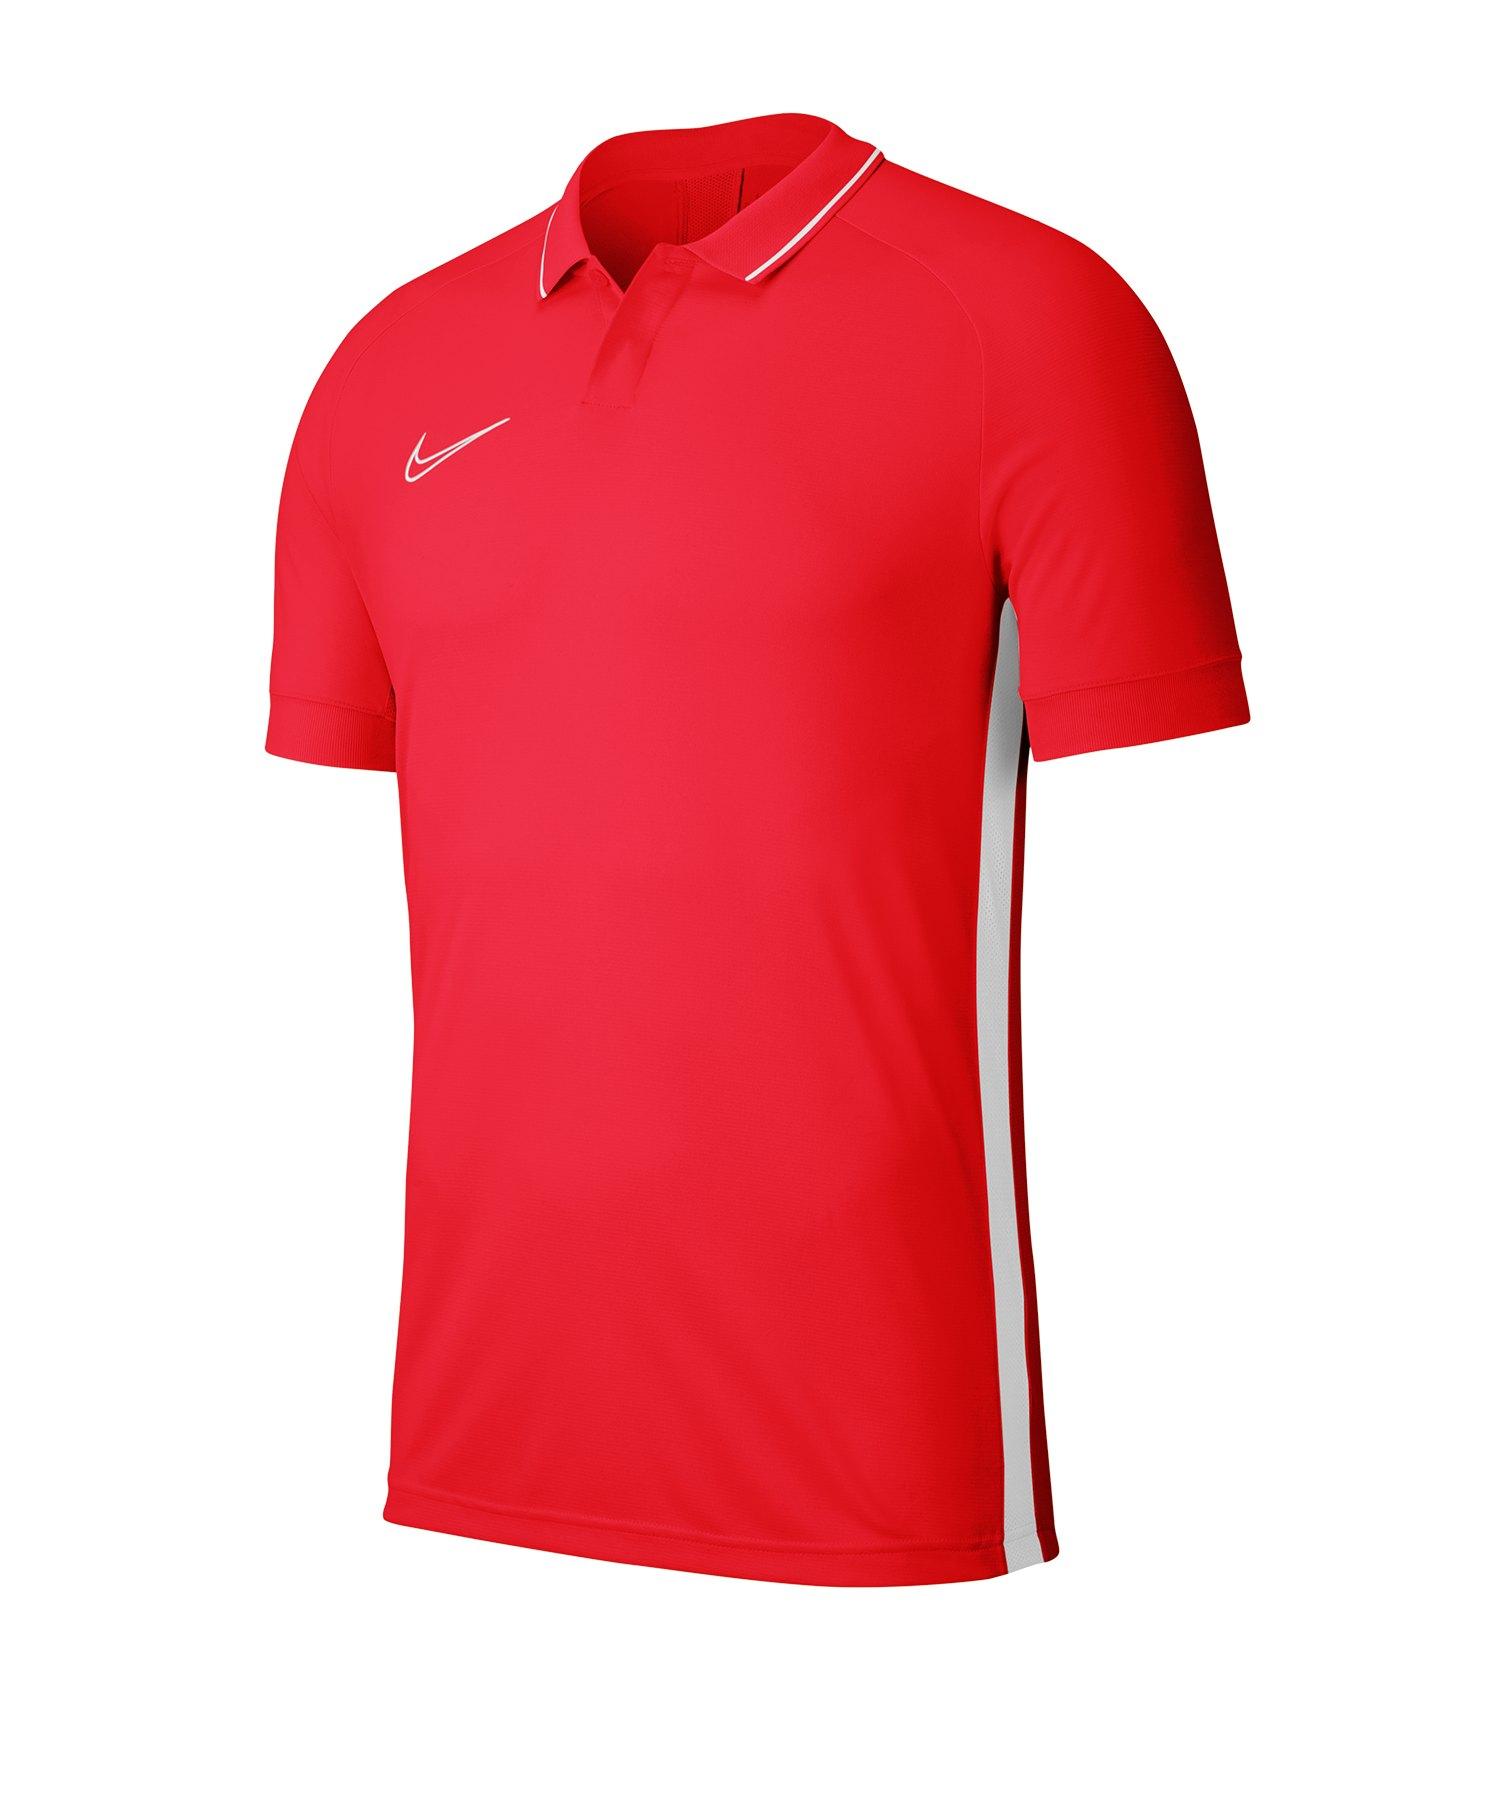 Nike Academy 19 Poloshirt Kids Rot F671 - rot